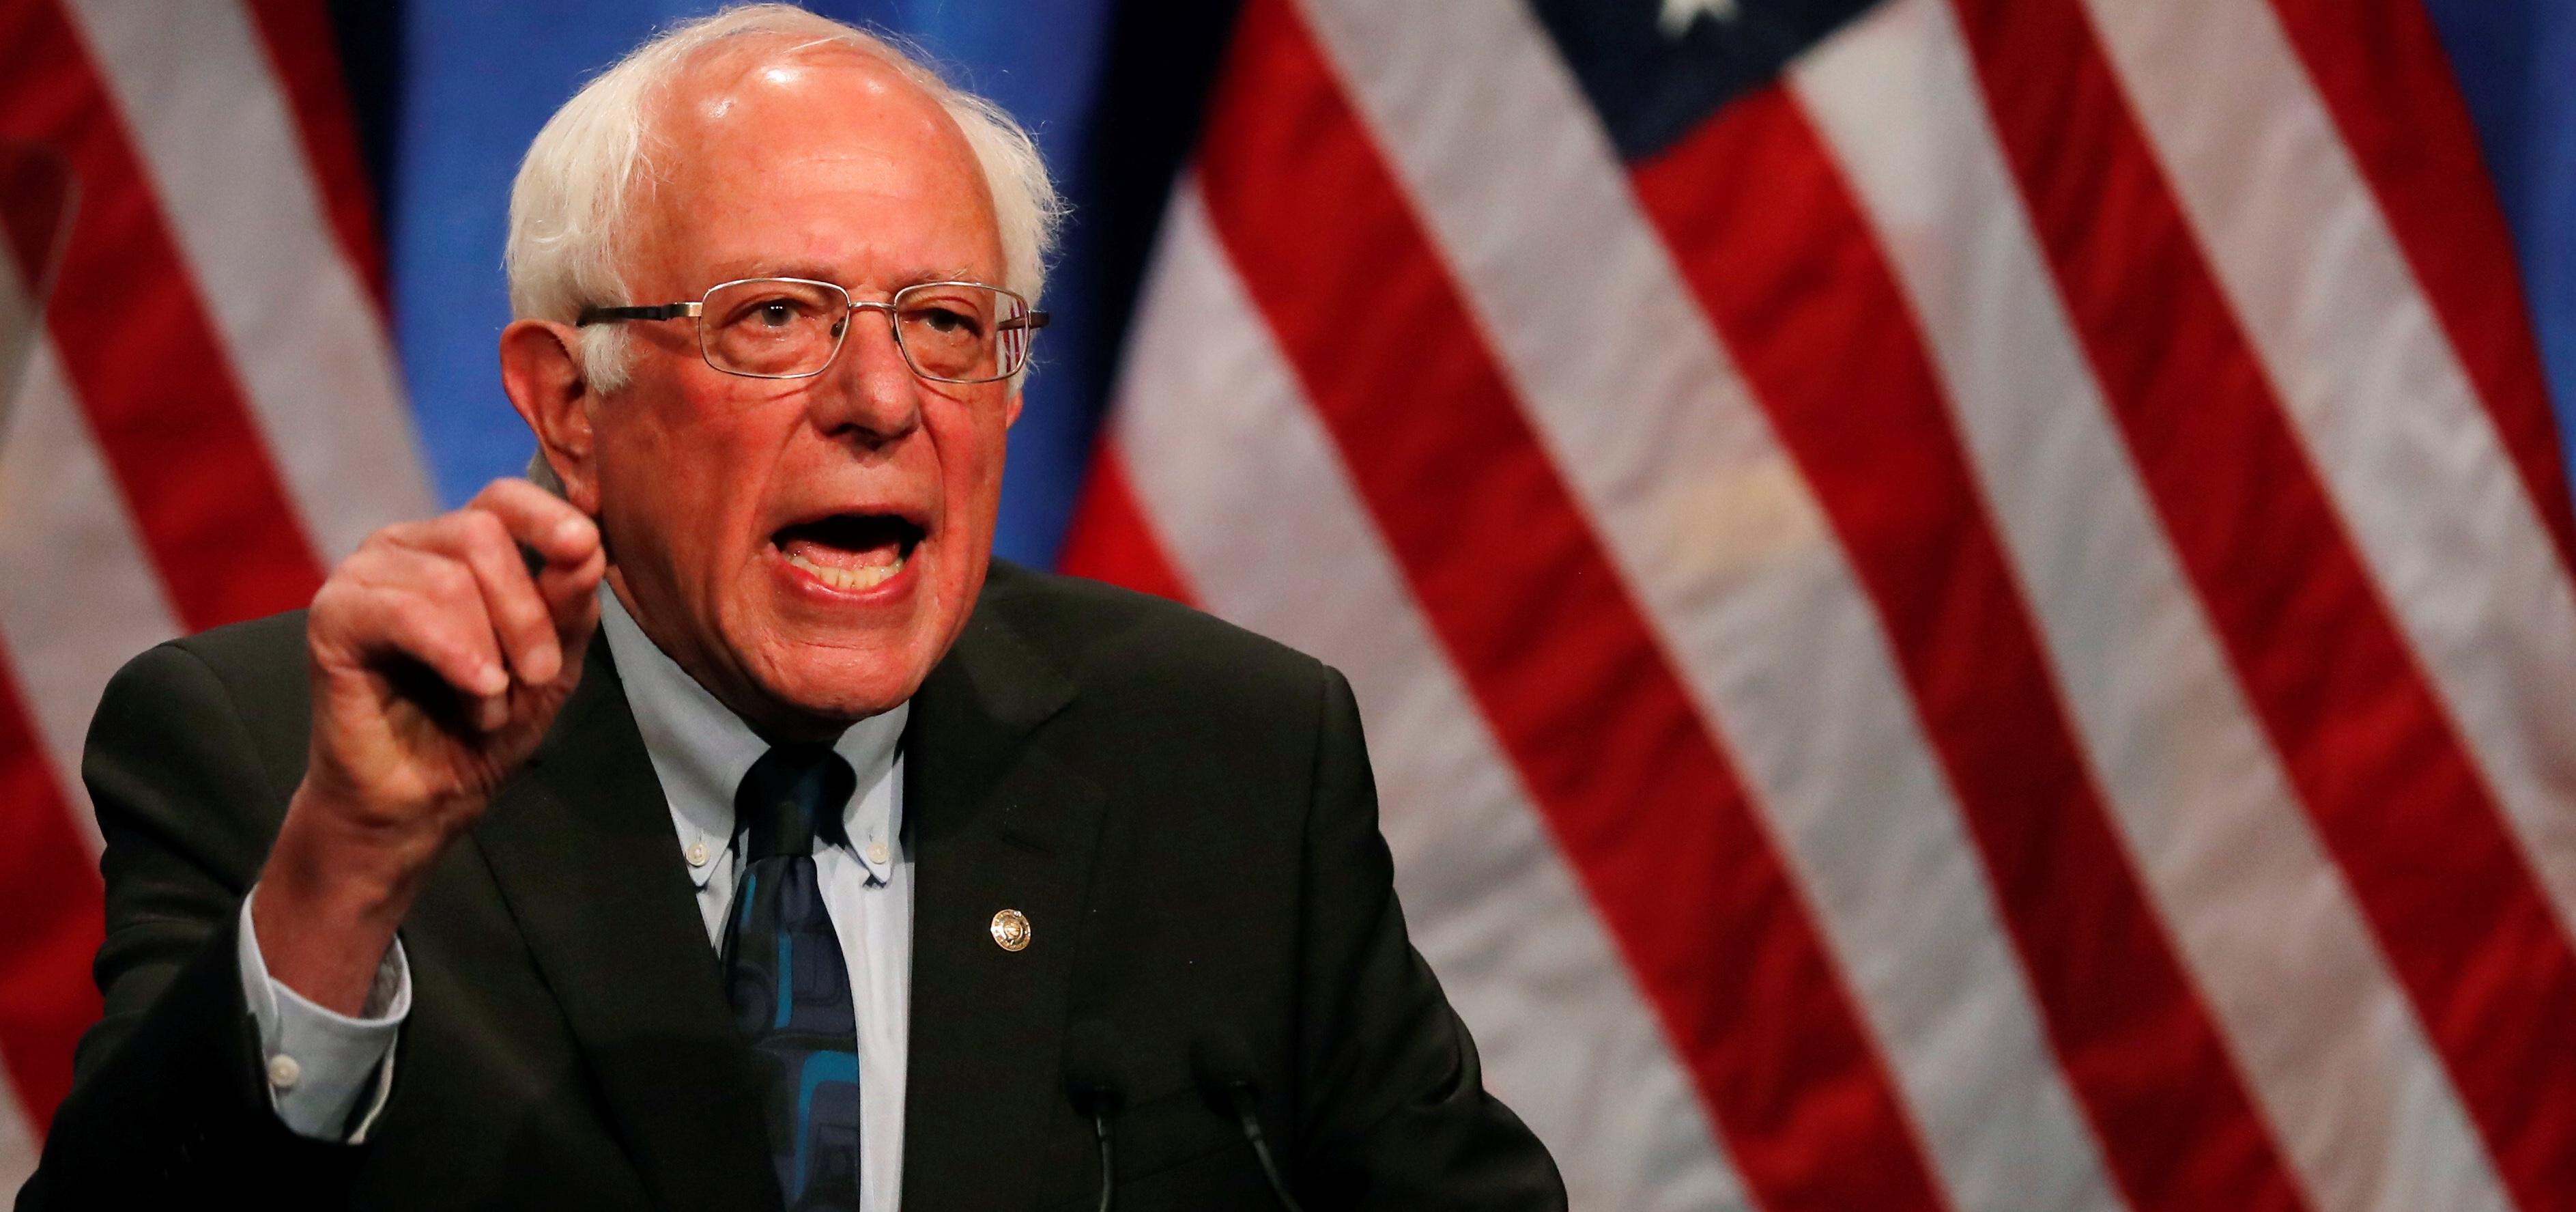 Democratic 2020 U.S. presidential candidate Senator Bernie Sanders attends a campaign event at George Washington University in Washington, D.C., U.S. June 12, 2019. REUTERS/Carlos Barria